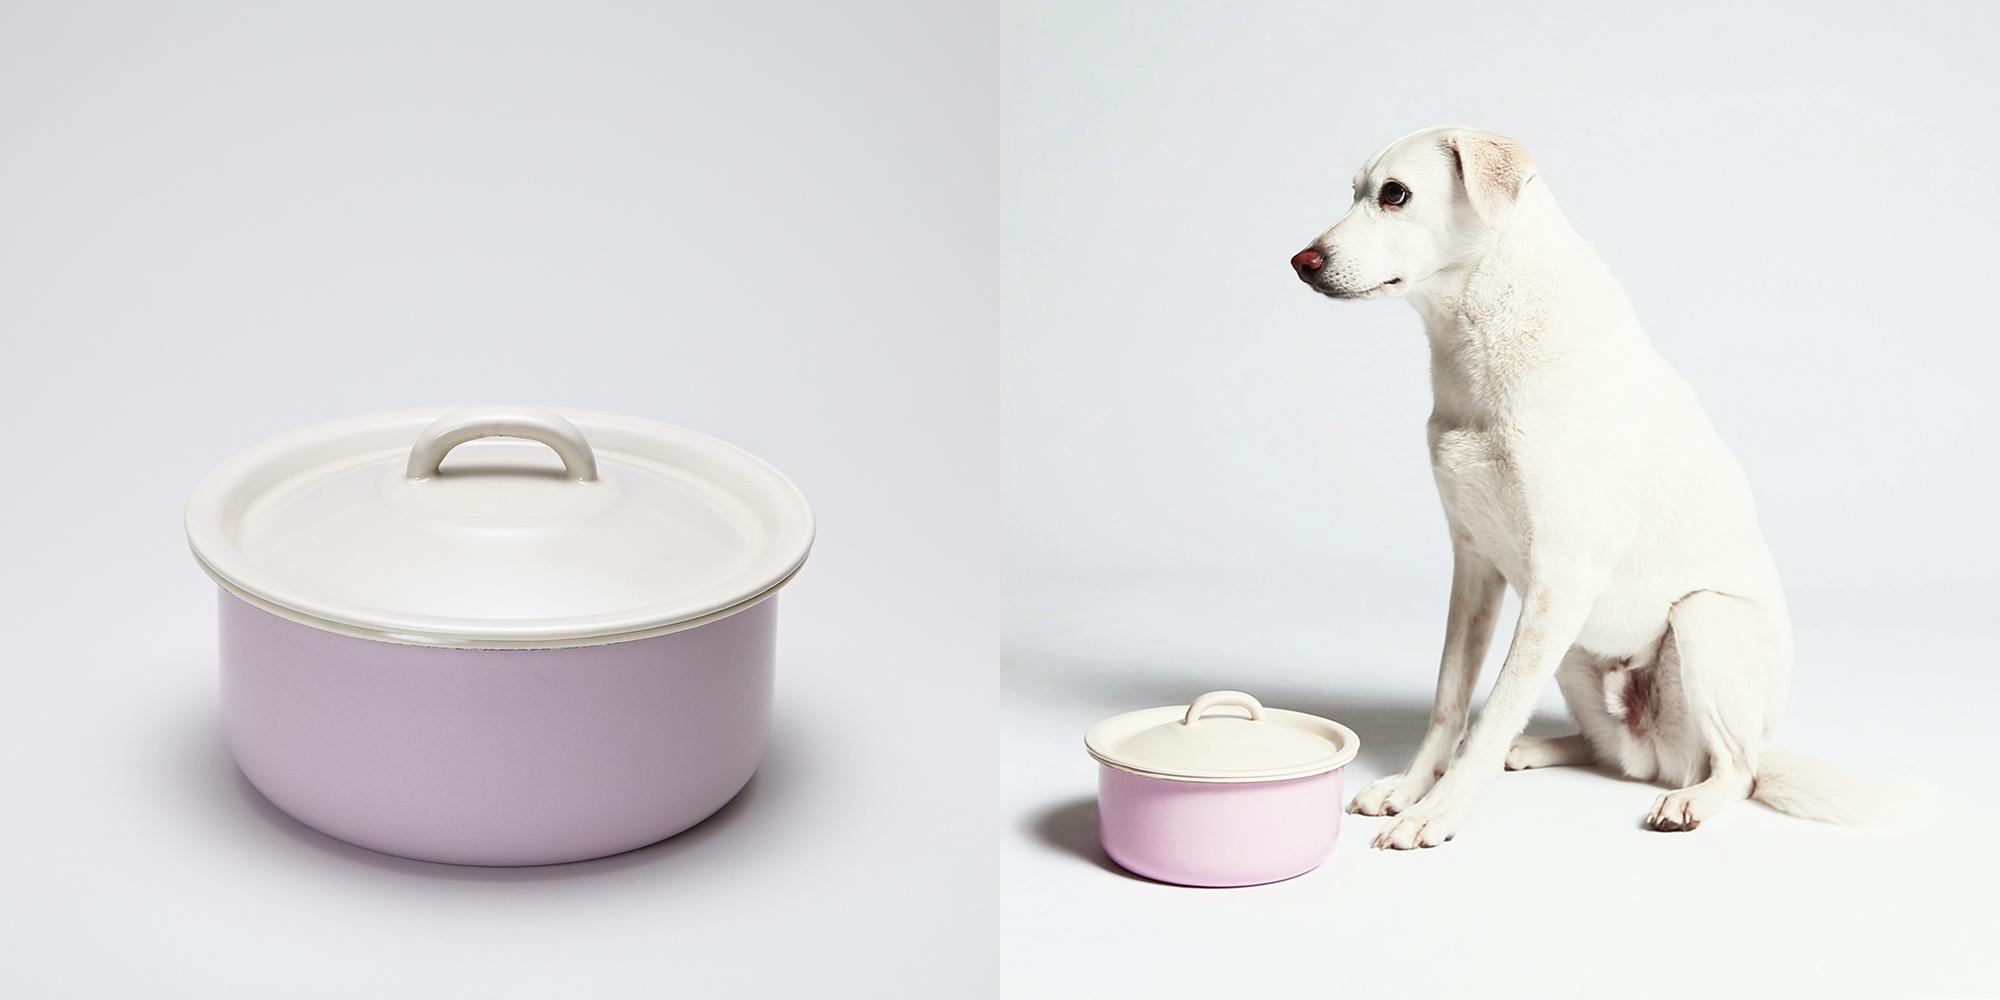 Cloud7 enamel bowl with lid